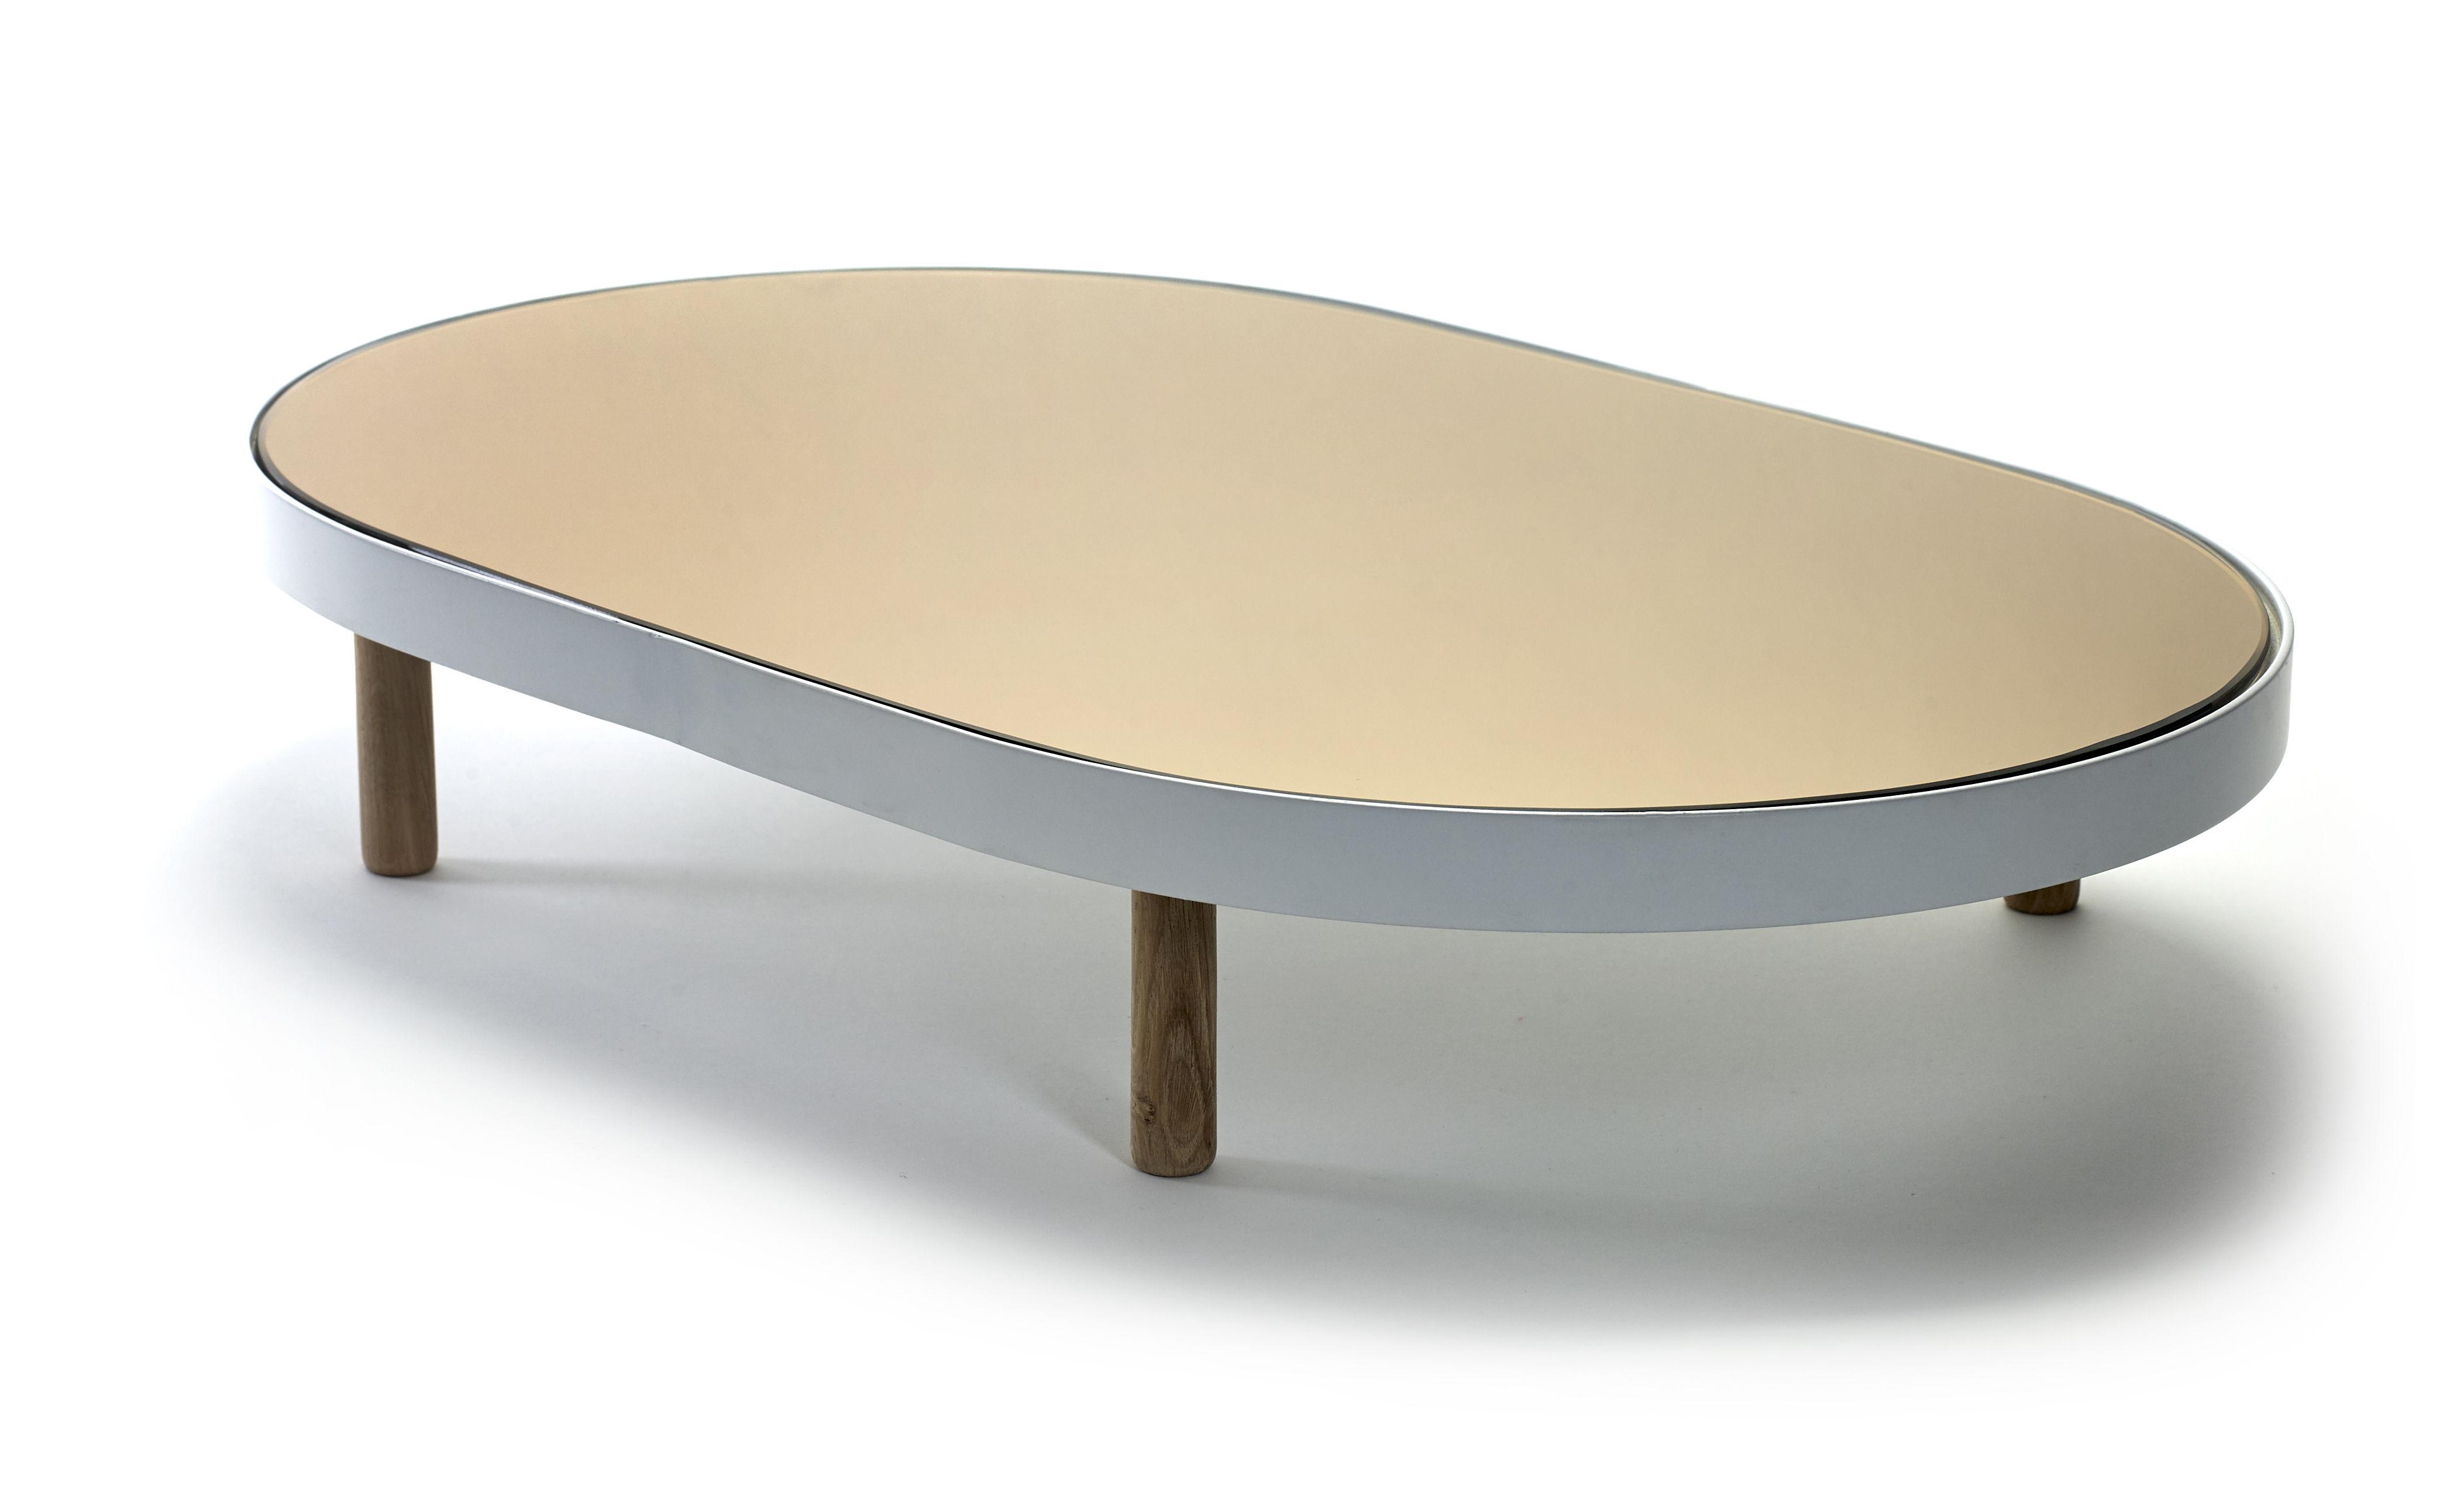 reflect tablett spiegel oval 67 x 41 cm wei. Black Bedroom Furniture Sets. Home Design Ideas